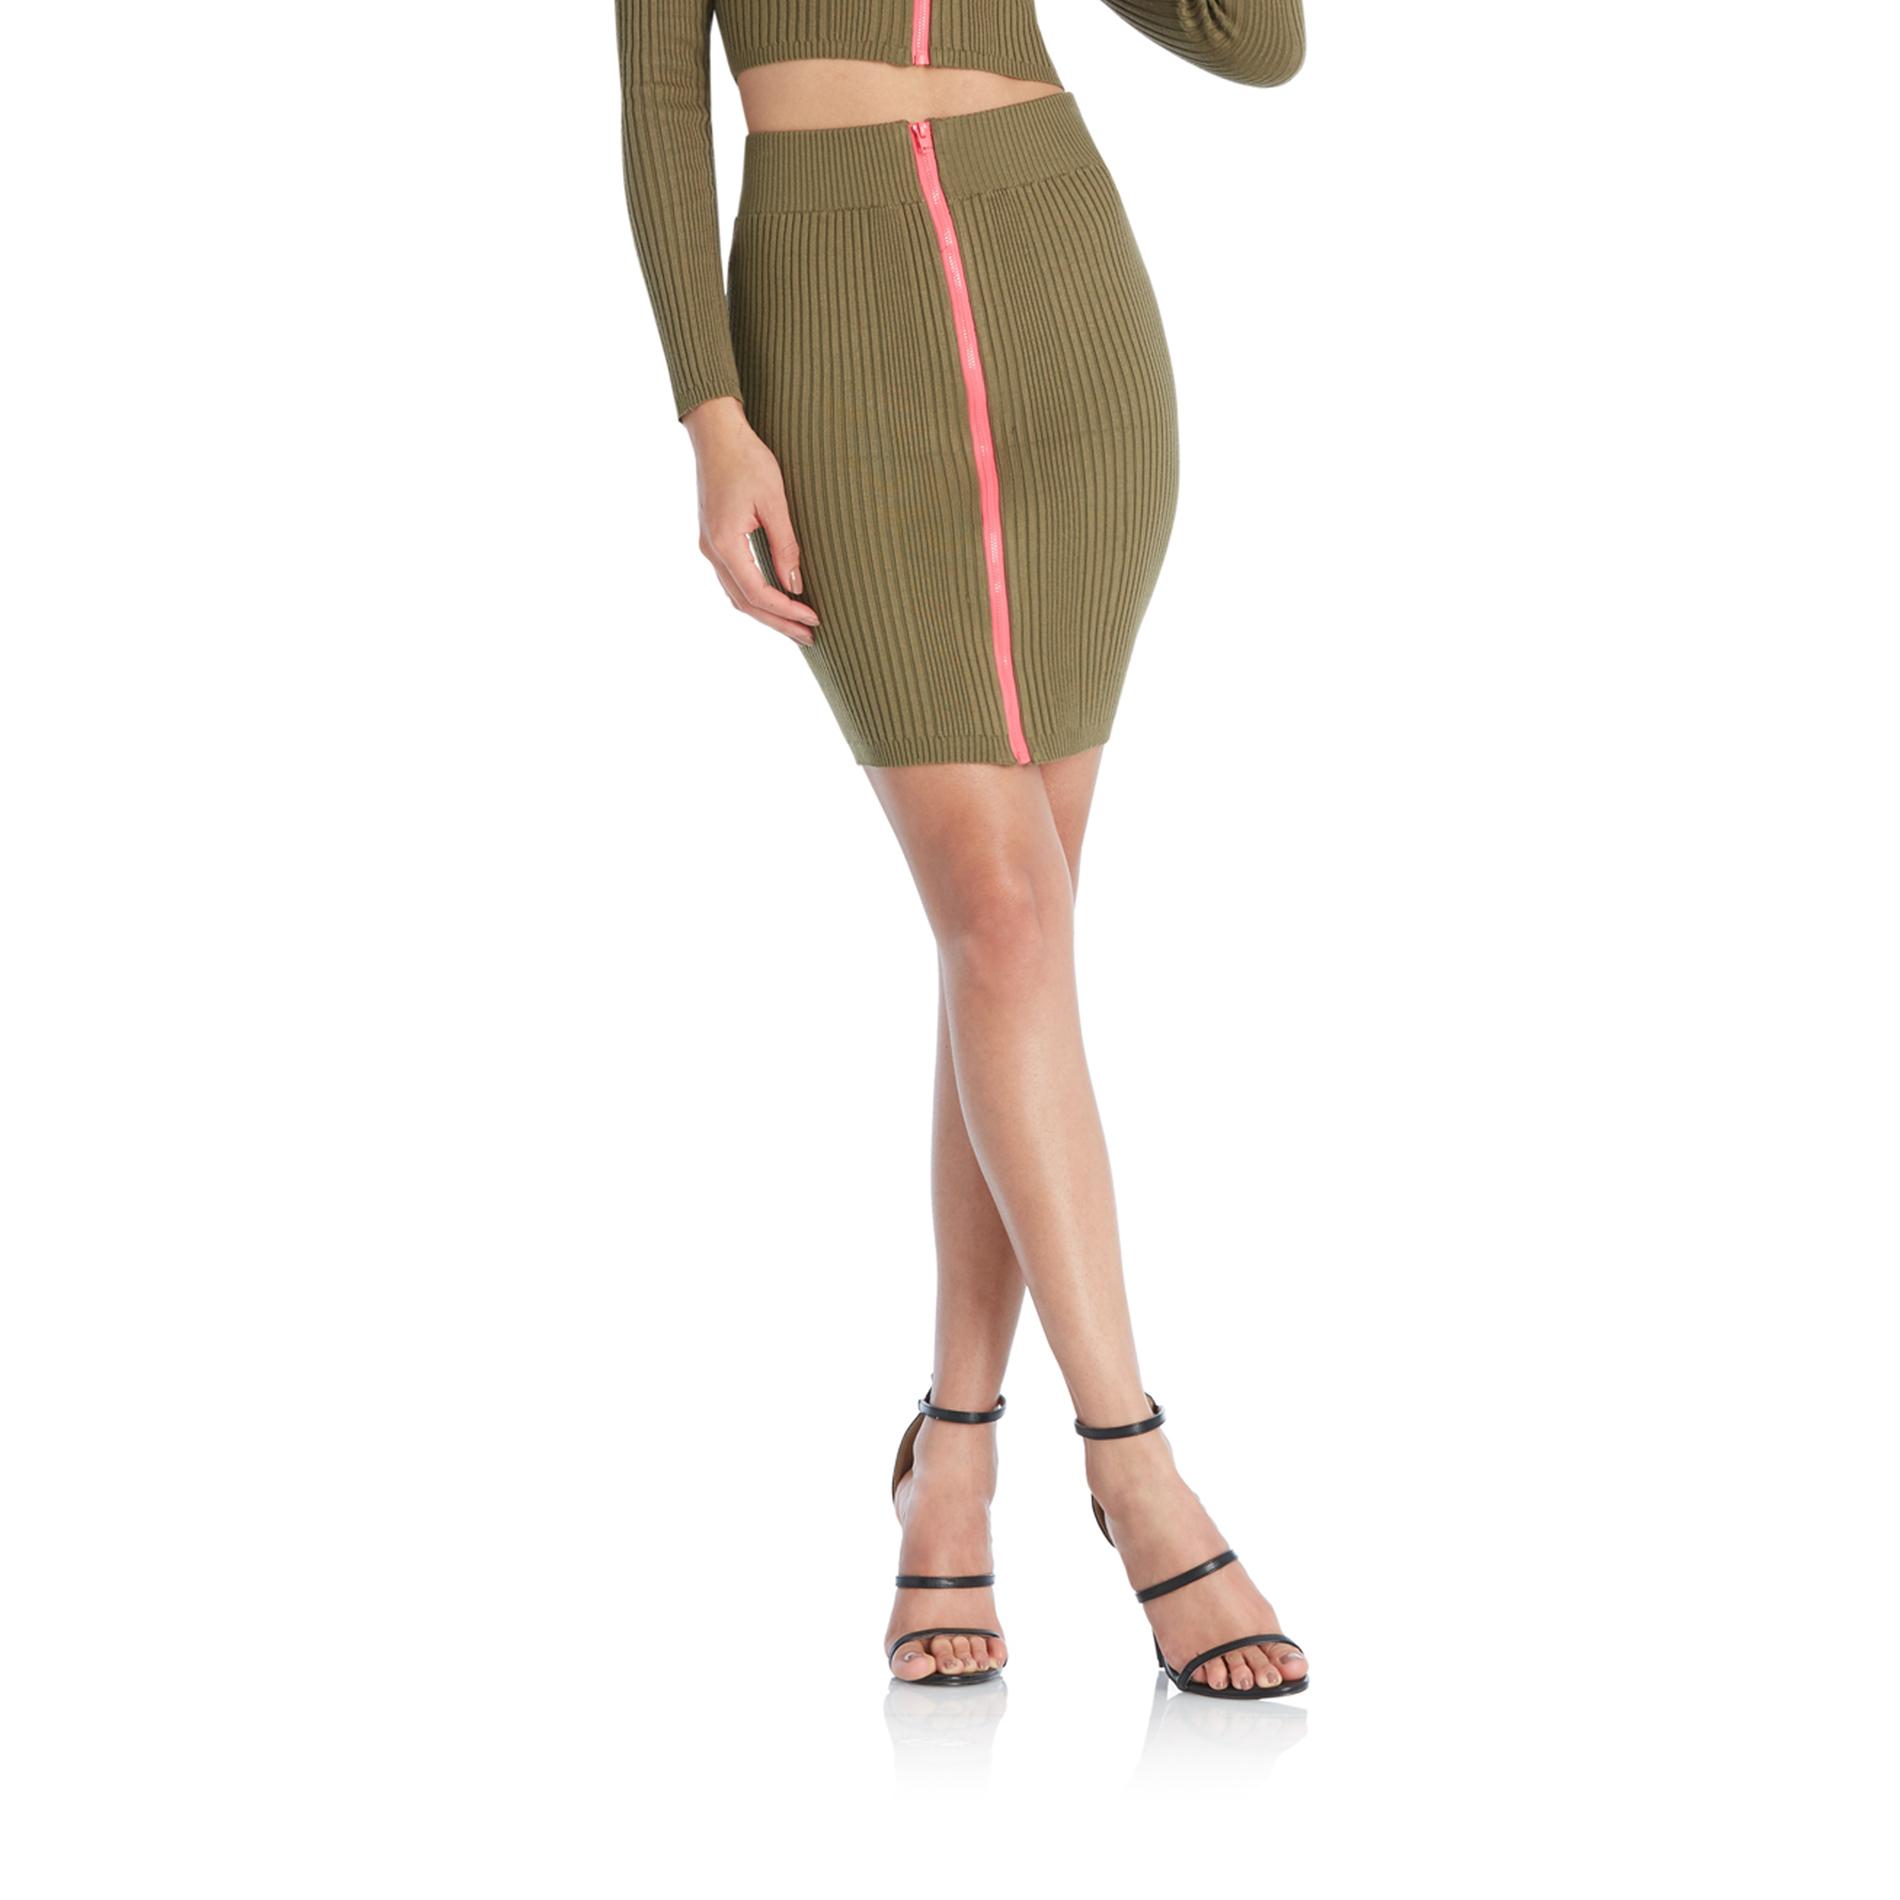 Nicki Minaj Women's Plus Sweater Knit Zip Front Pencil Skirt PartNumber: 042VA90586512P MfgPartNumber: 5T52579KM